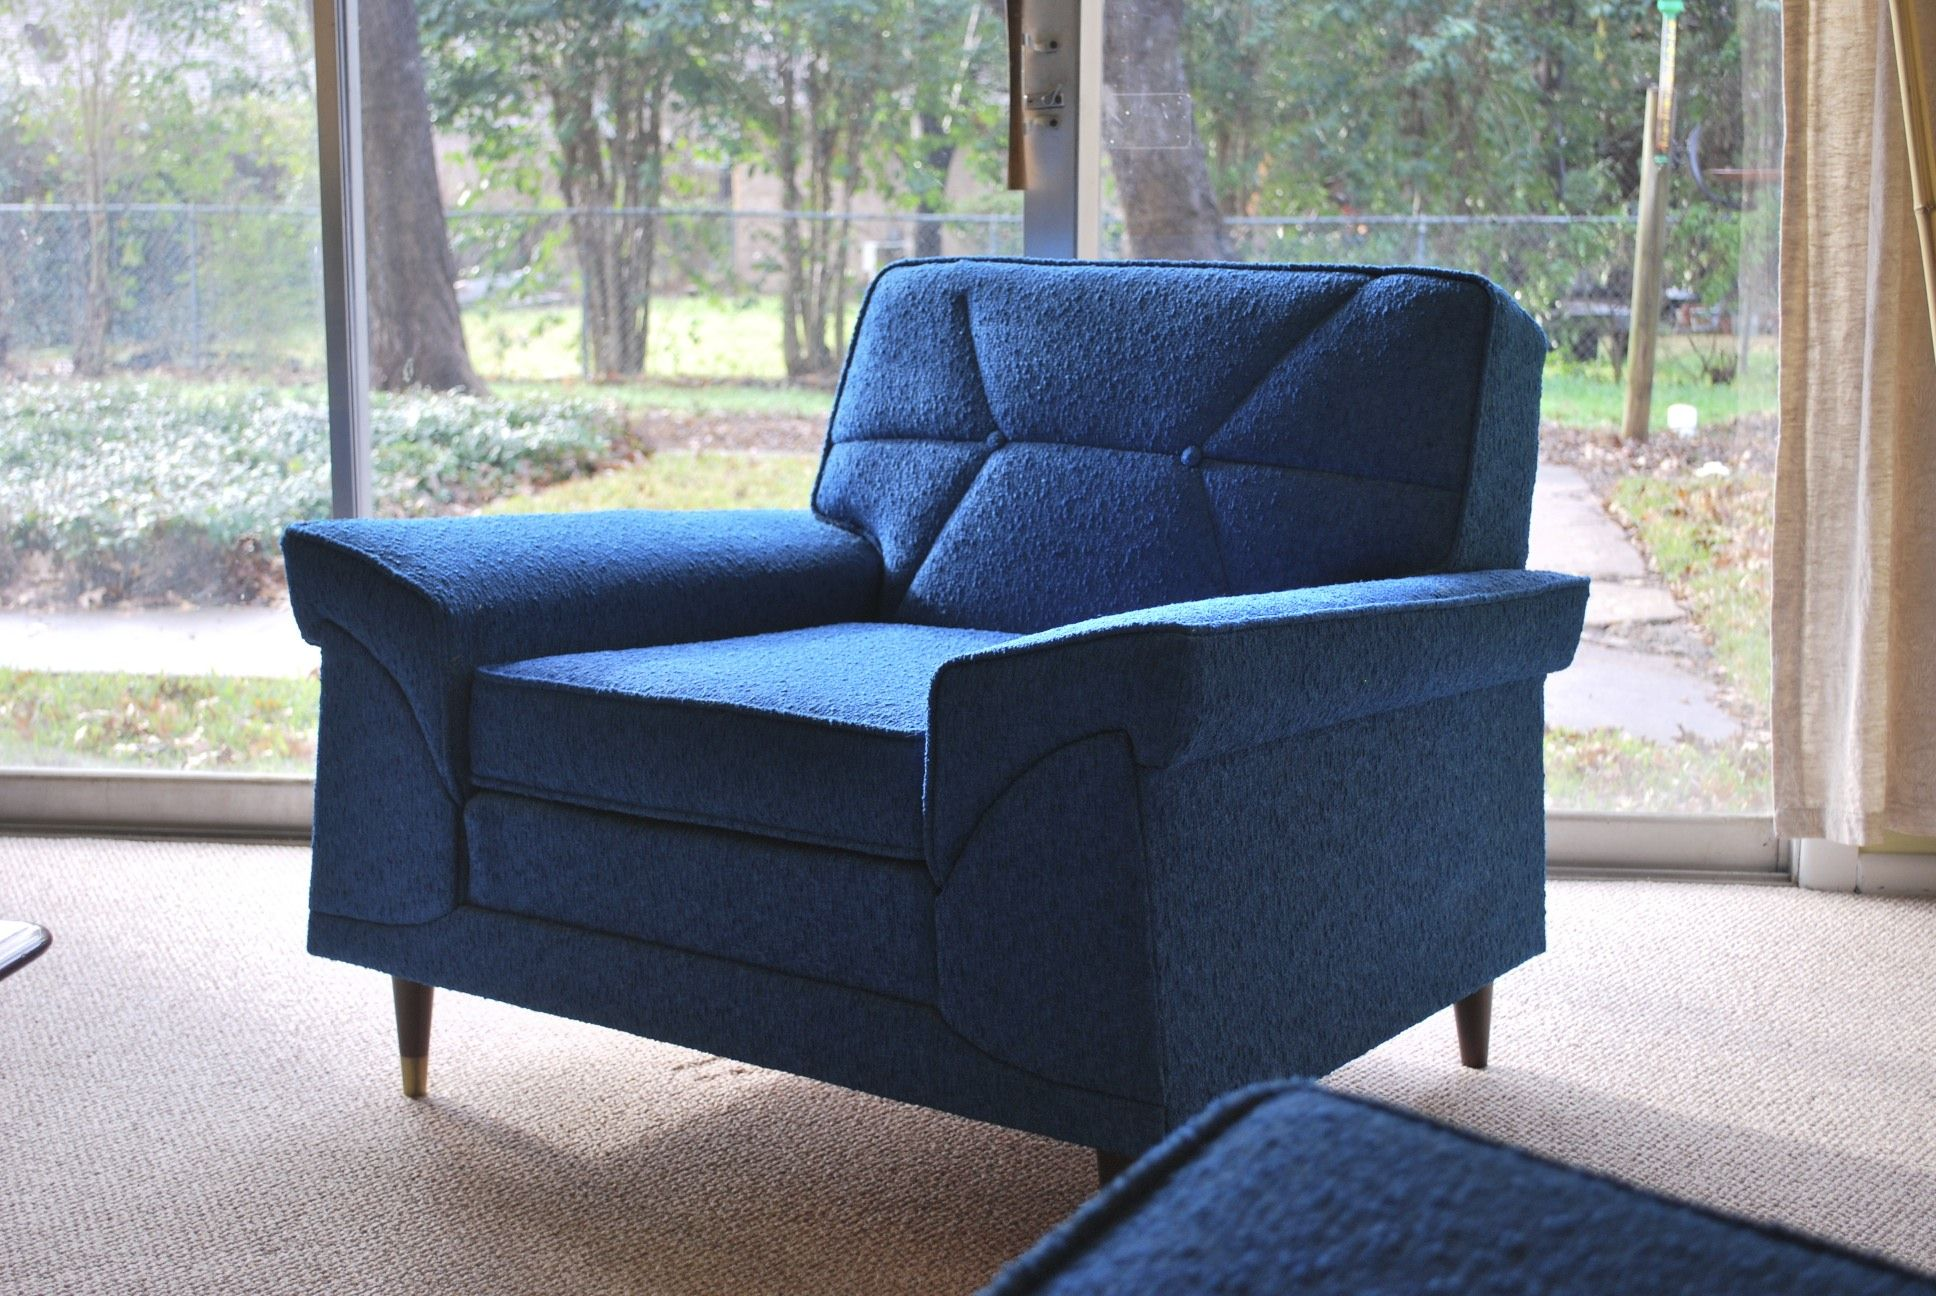 Kroehler Chair Home Style Pinterest